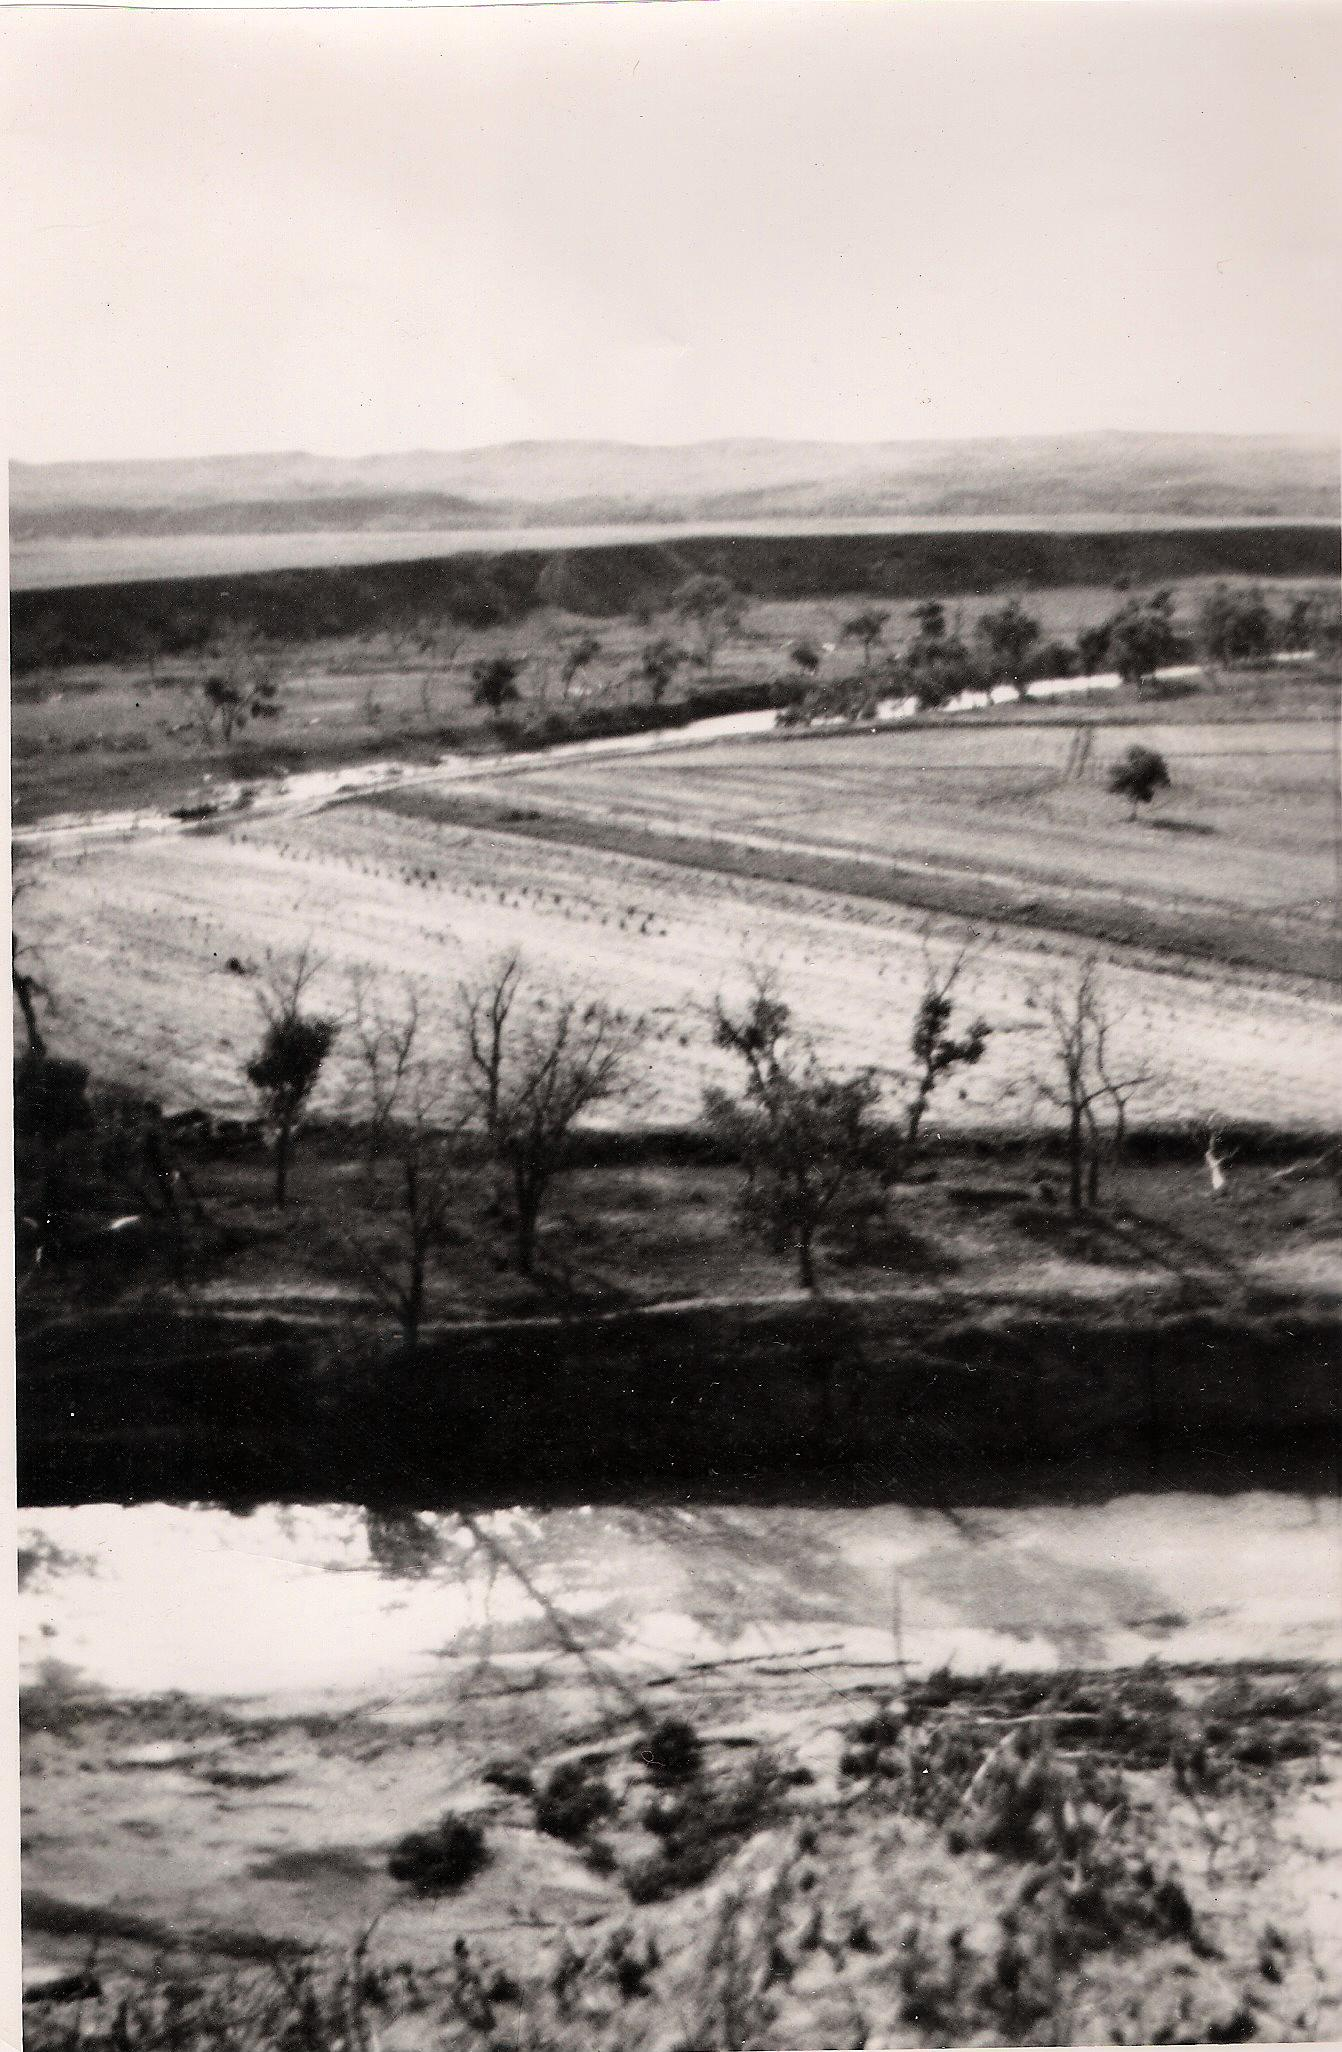 Cheyenne River view